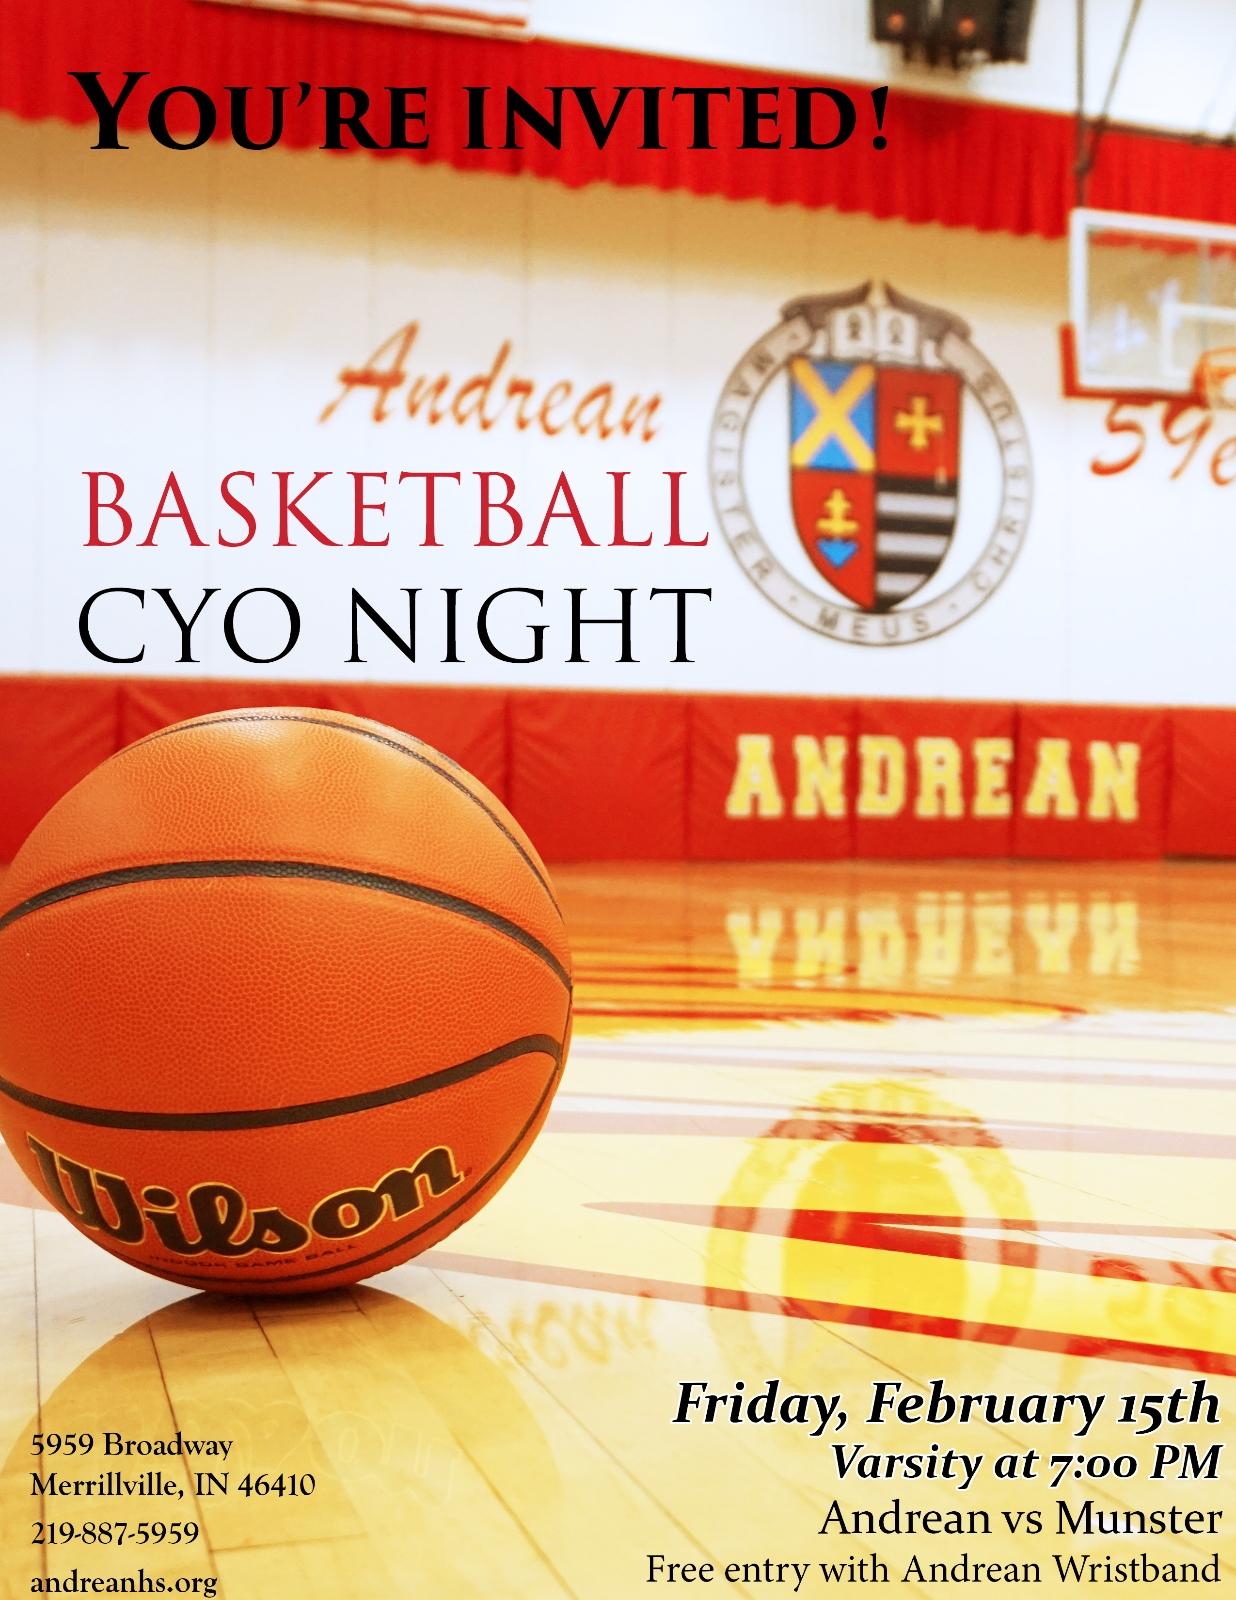 Boys Basketball Reschedules CYO Night to Friday February 15th